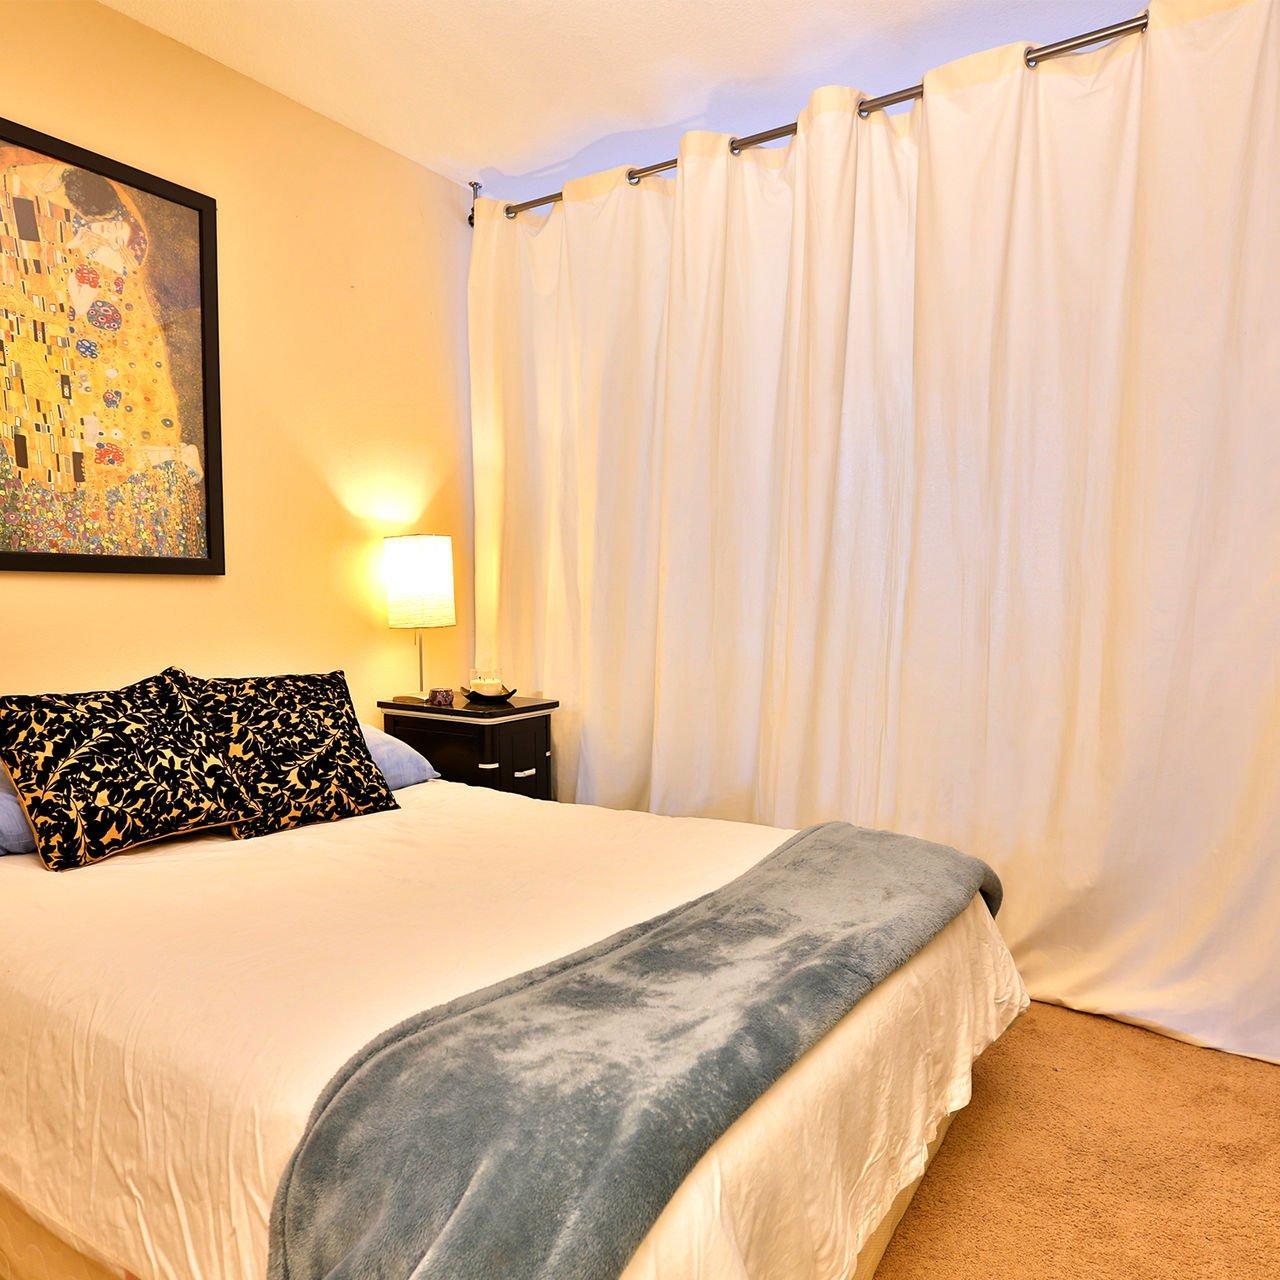 Amazon.com: RoomDividersNow Muslin Room Divider Curtain, 9ft Tall x ...